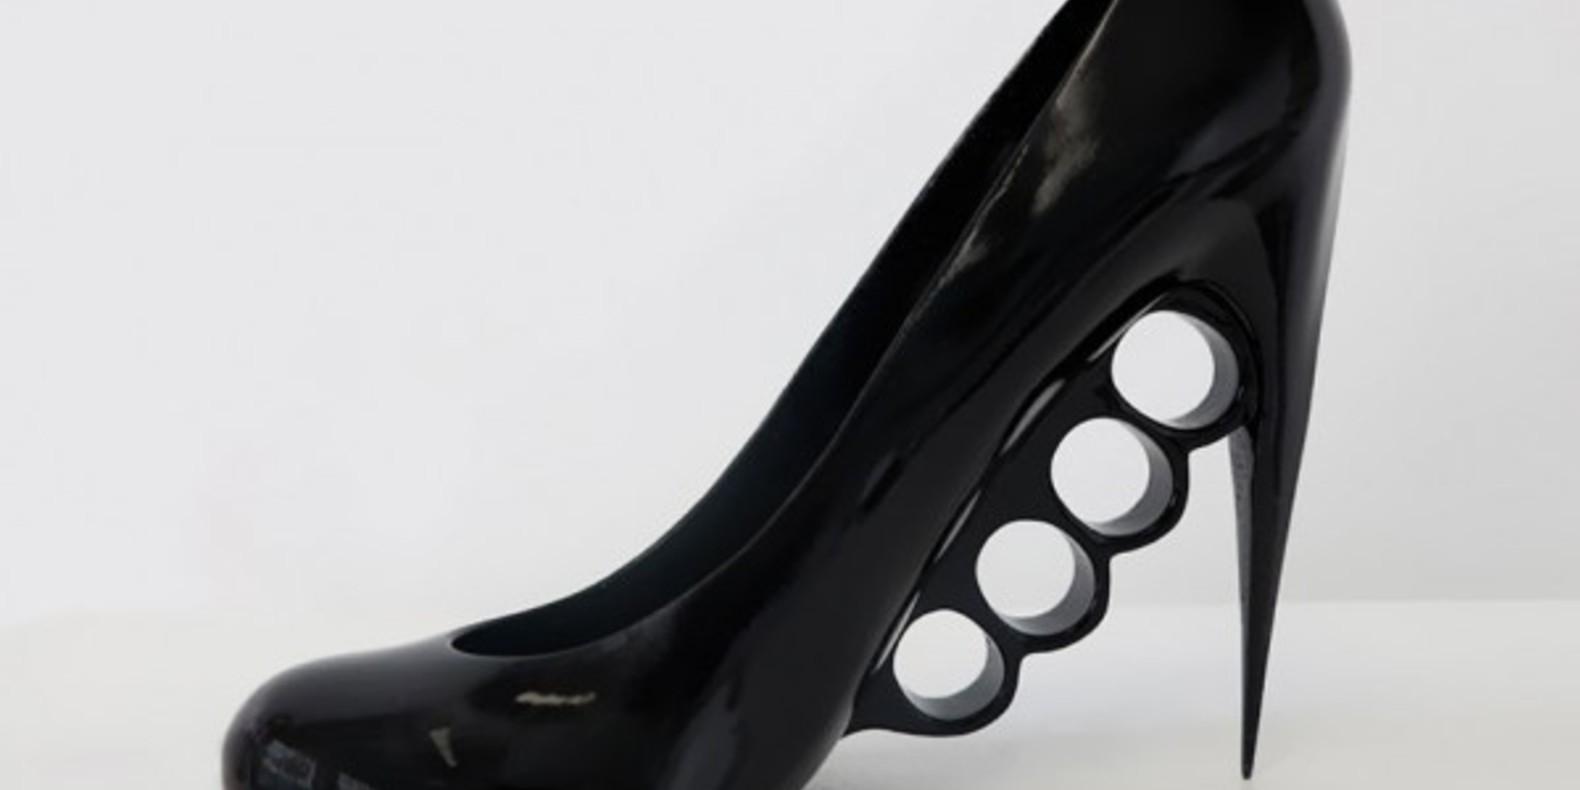 sebastian errazuriz shoe 3D print cults chaussures imprimees en 3D makerbot melissa designer 3D 10